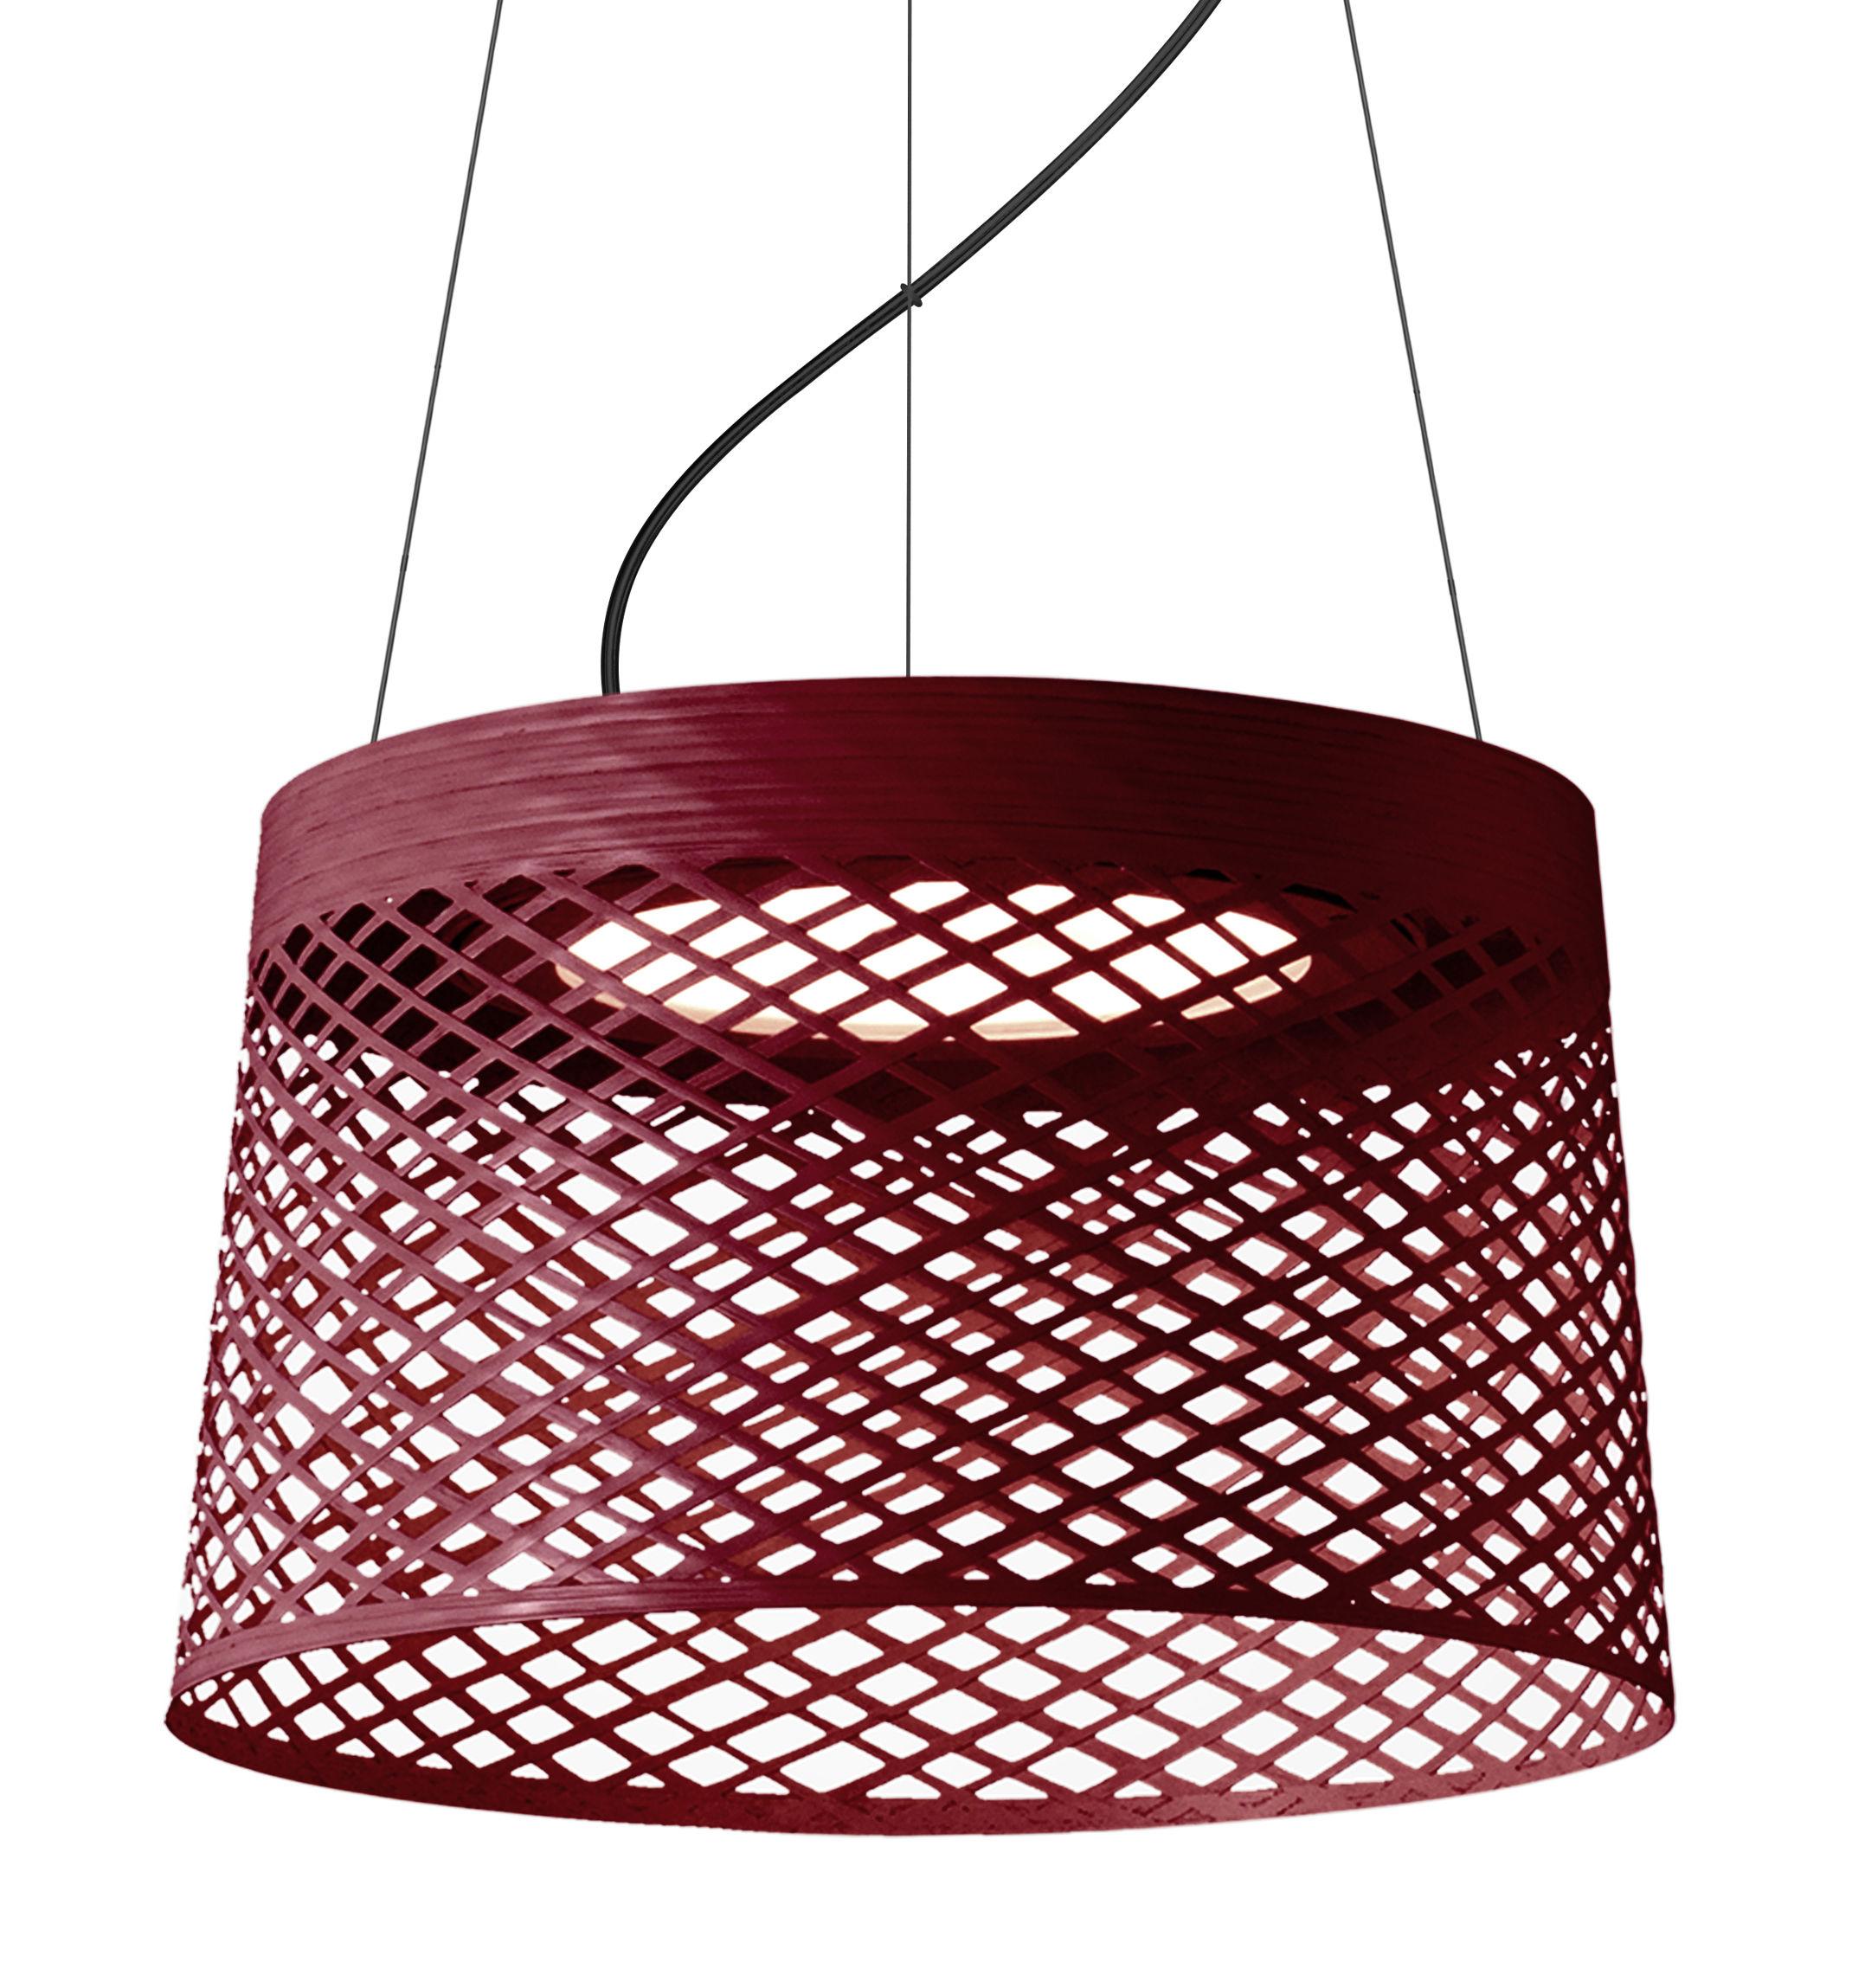 Luminaire - Suspensions - Suspension Twiggy Grid LED Outdoor / Ø 46 x H 29 cm - Foscarini - Carmin - Fibre de verre, Matériau composite, Métal verni